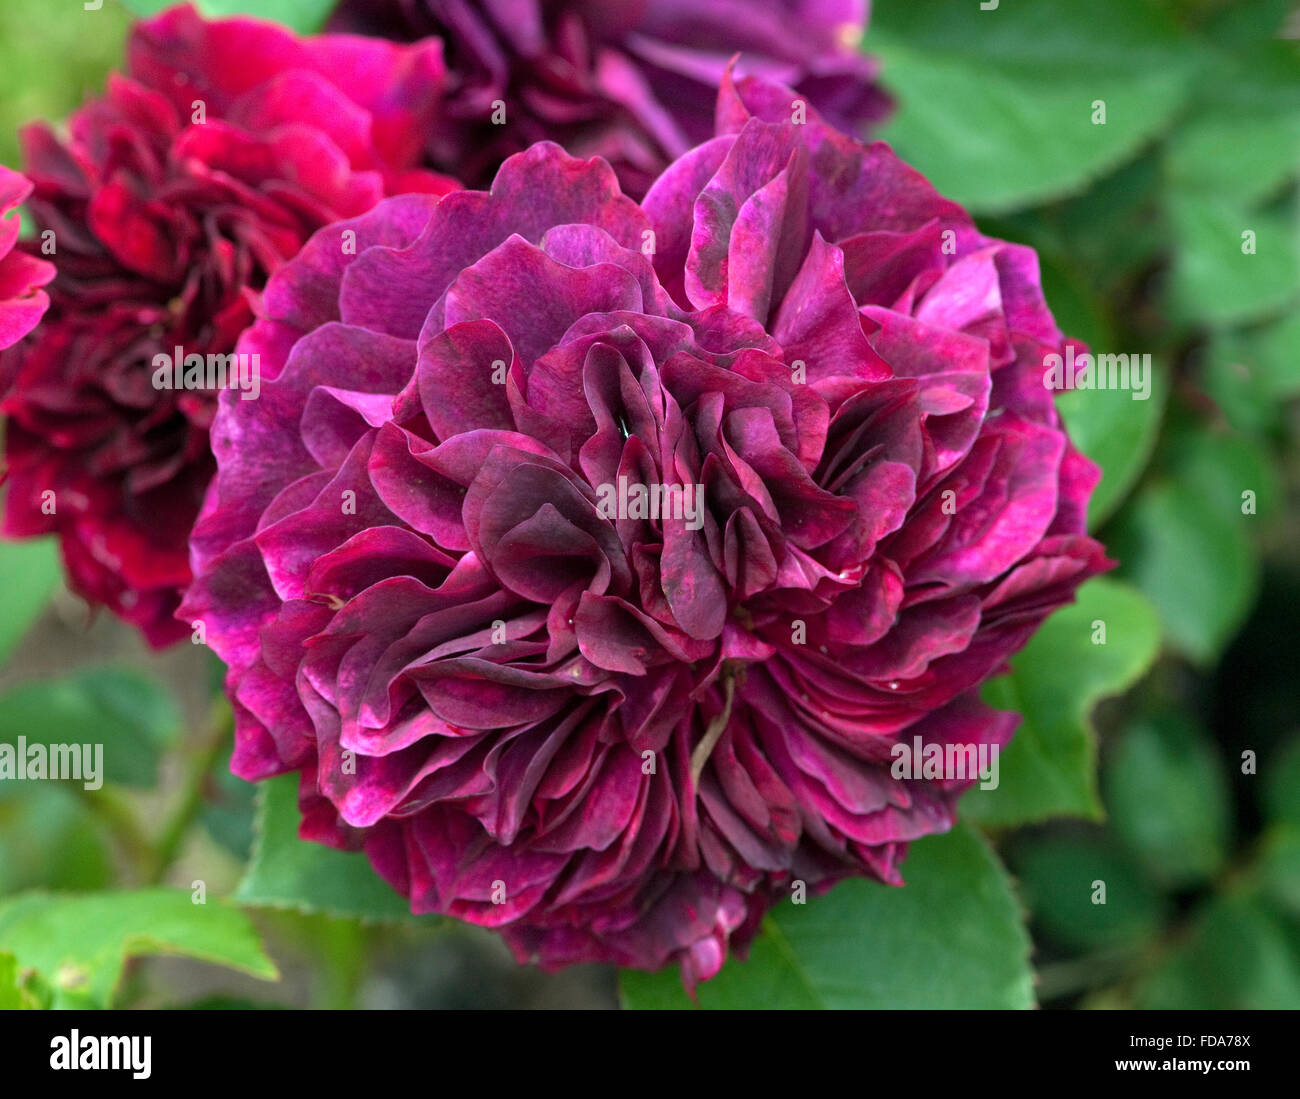 Englische Rose, prospero - Stock Image